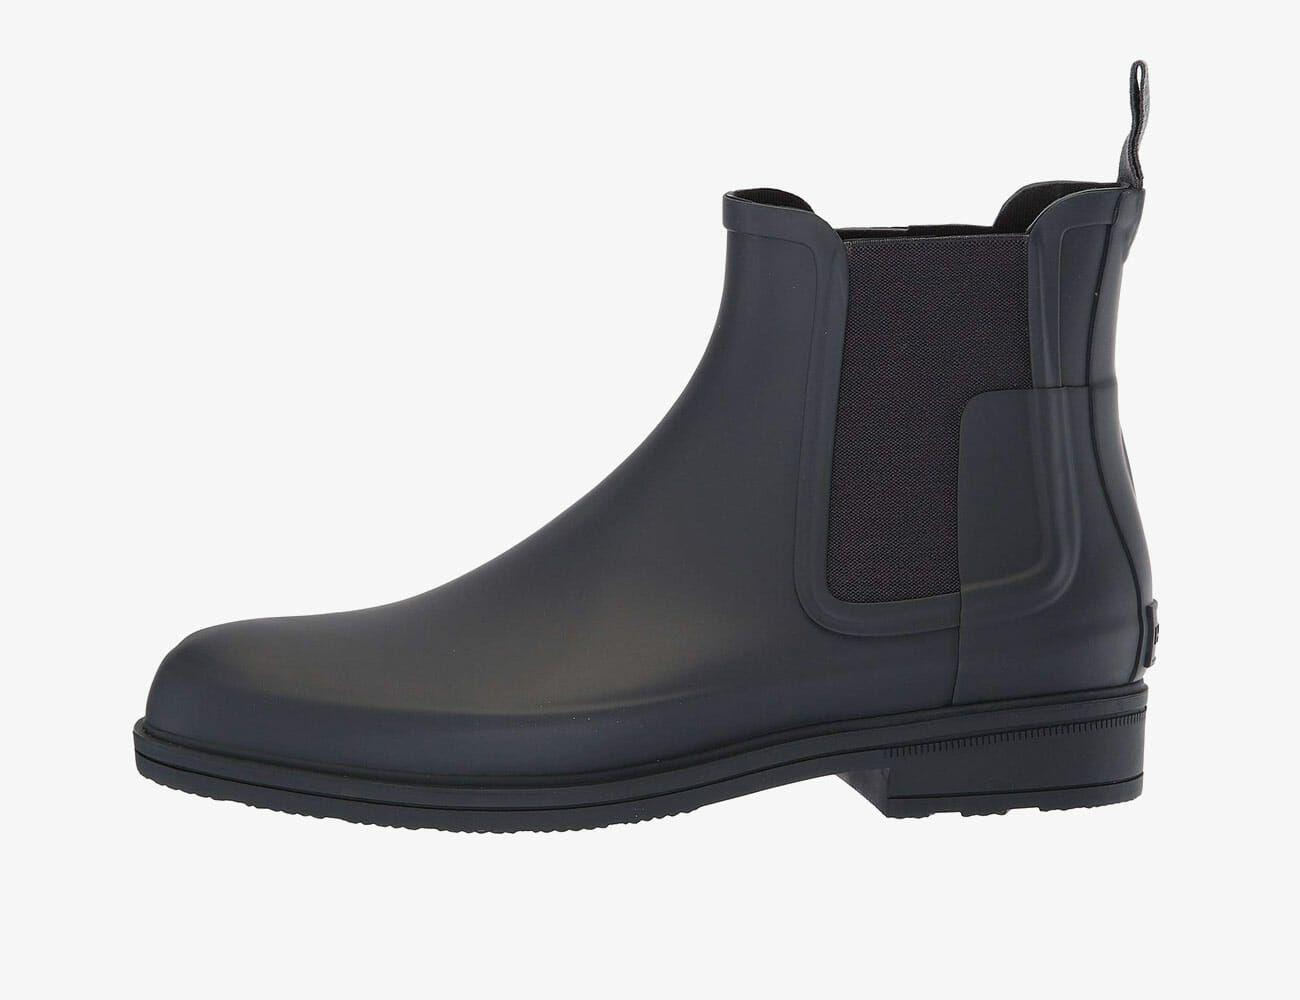 Waterproof Boots All Terrain Rain Shoes  